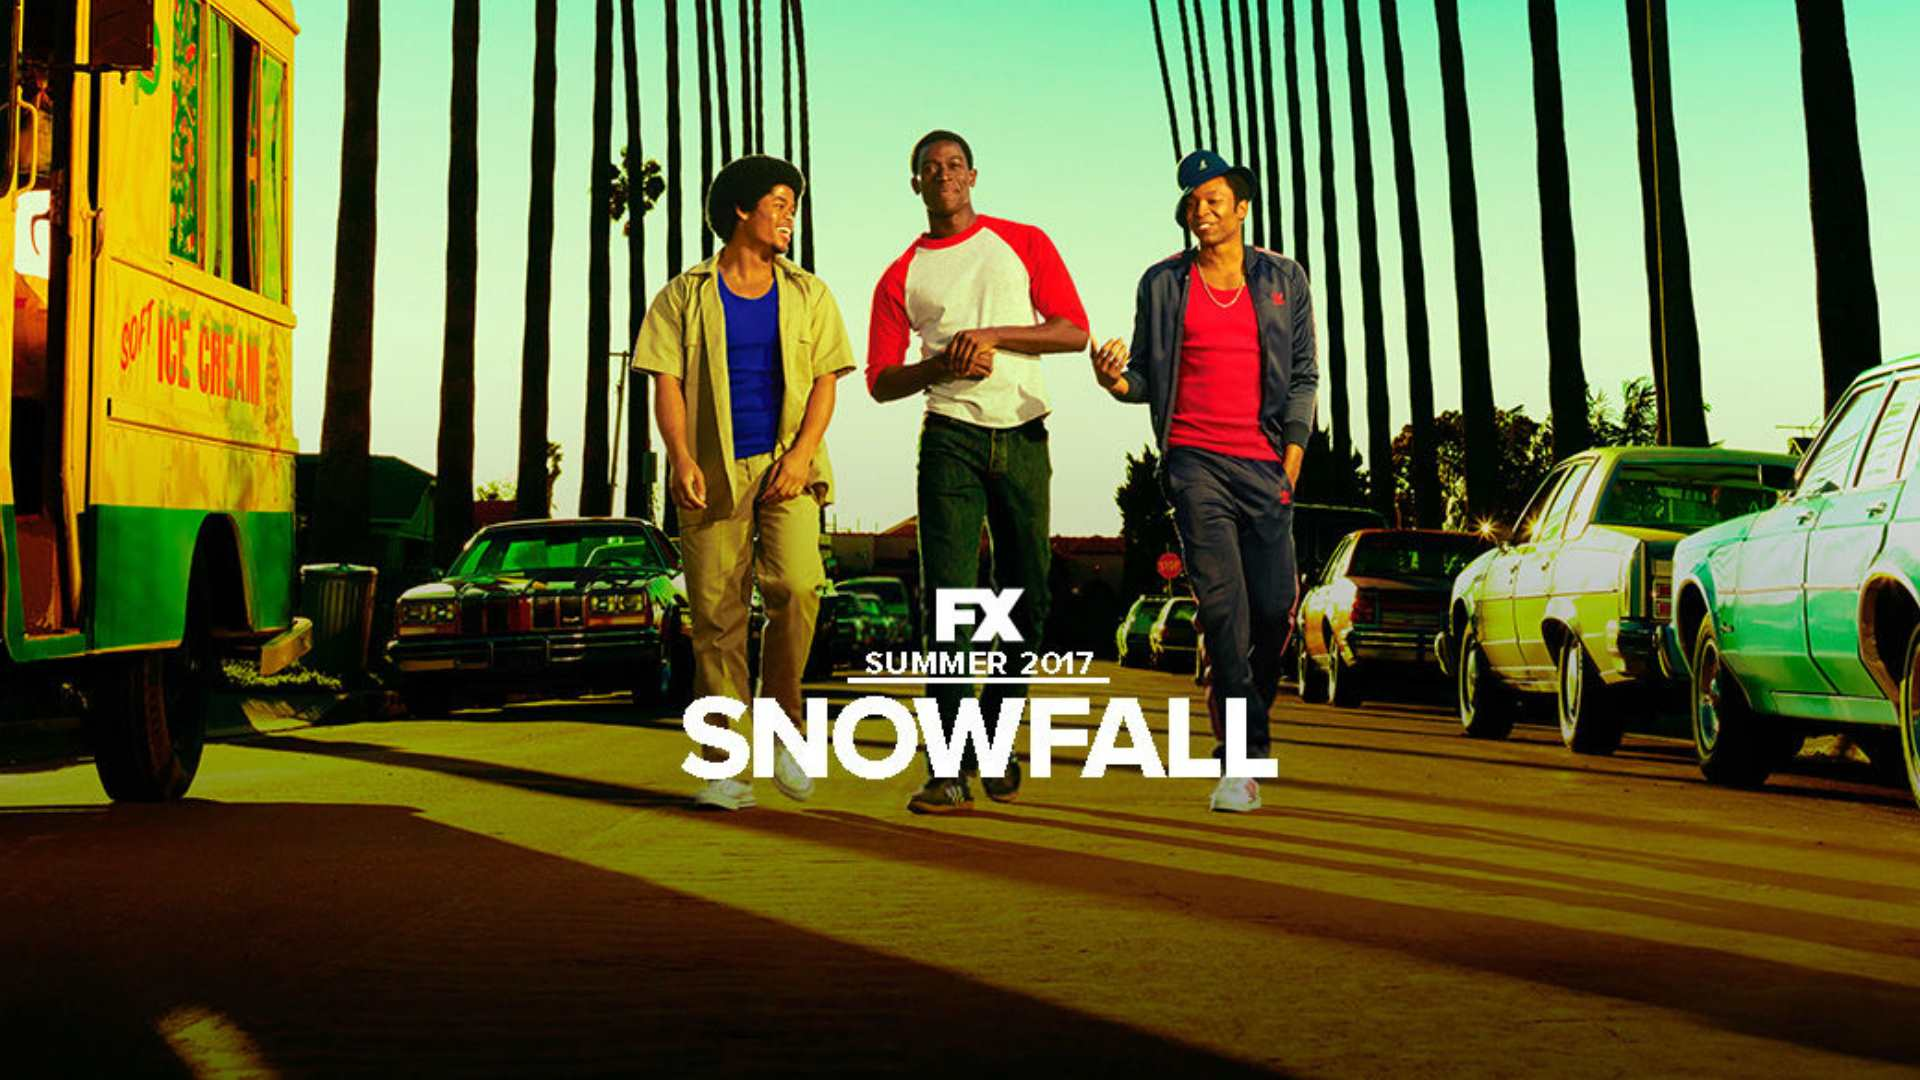 Snowfall Season 1 Watch On Primewire For Free Without Registration Aquí se encuentra la ficha profesional de karen malina white. primewire top